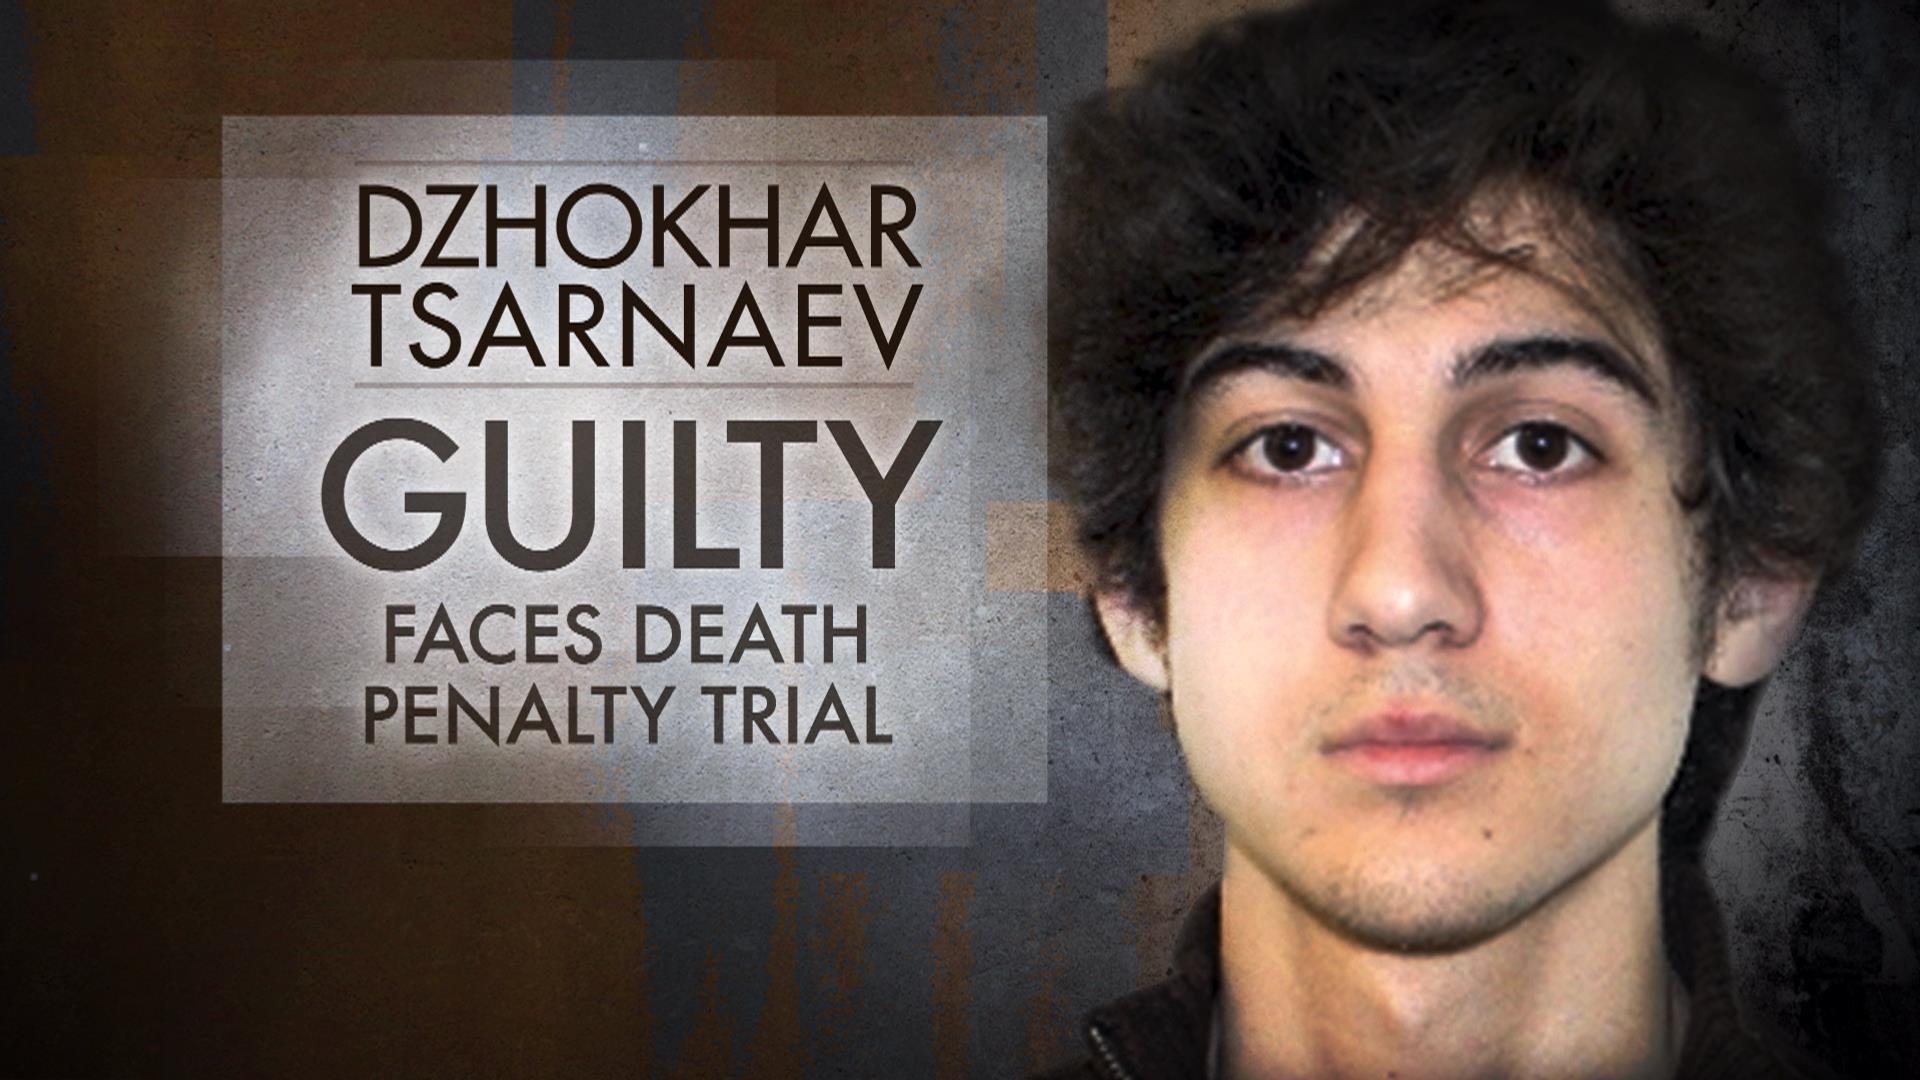 Boston Marathon Bomber Tsarnaev Guilty, Faces Death Penalty Trial